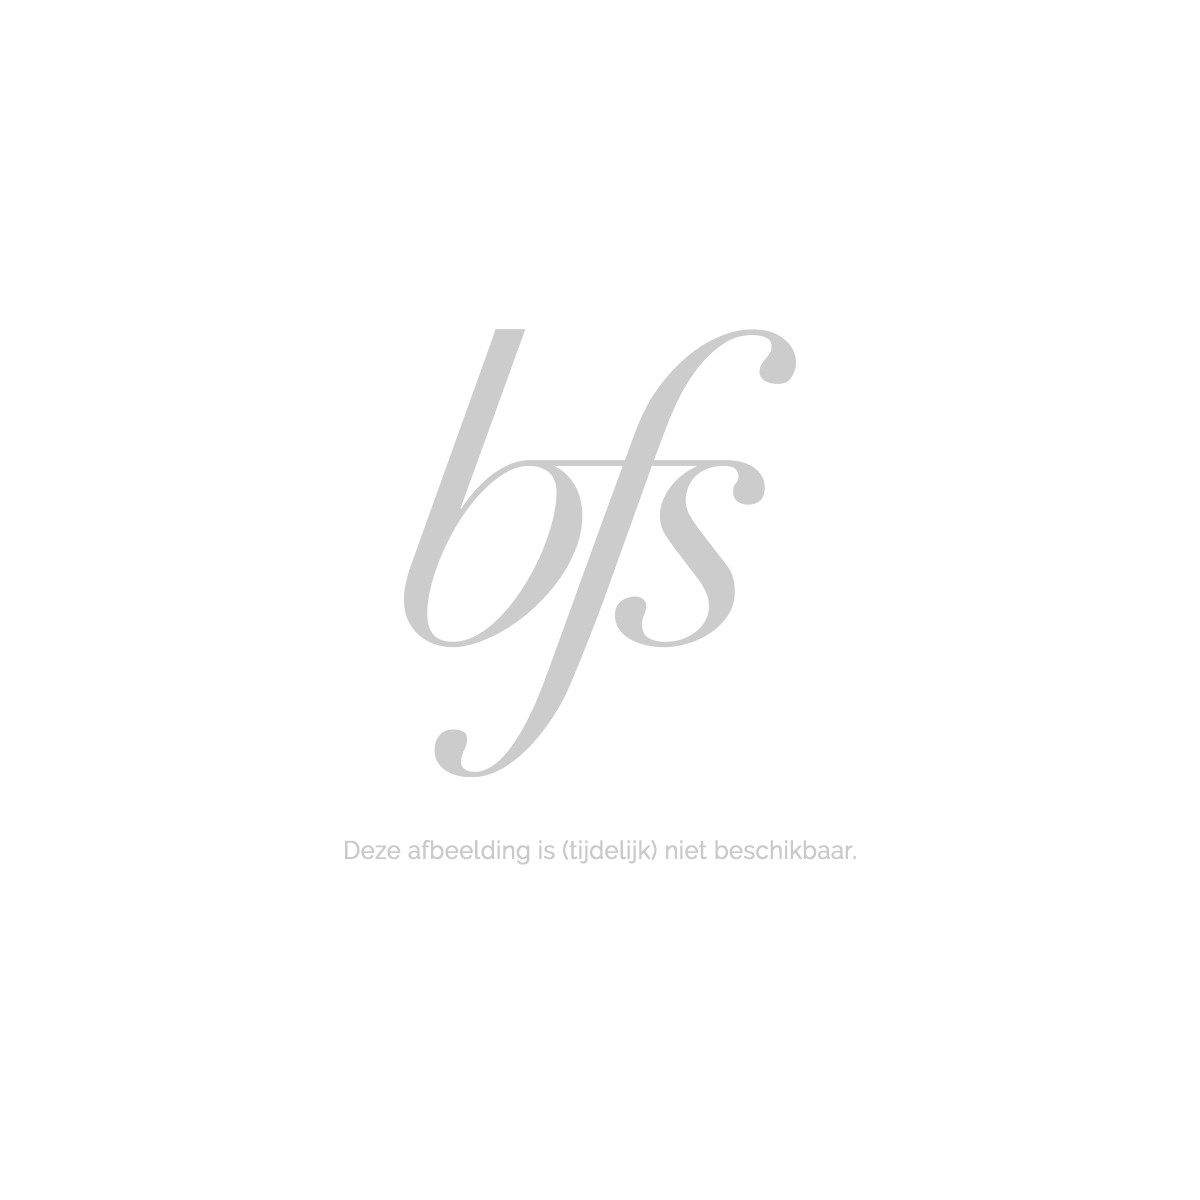 Ibp Designer Stiletto Tips Natural 12Pcs